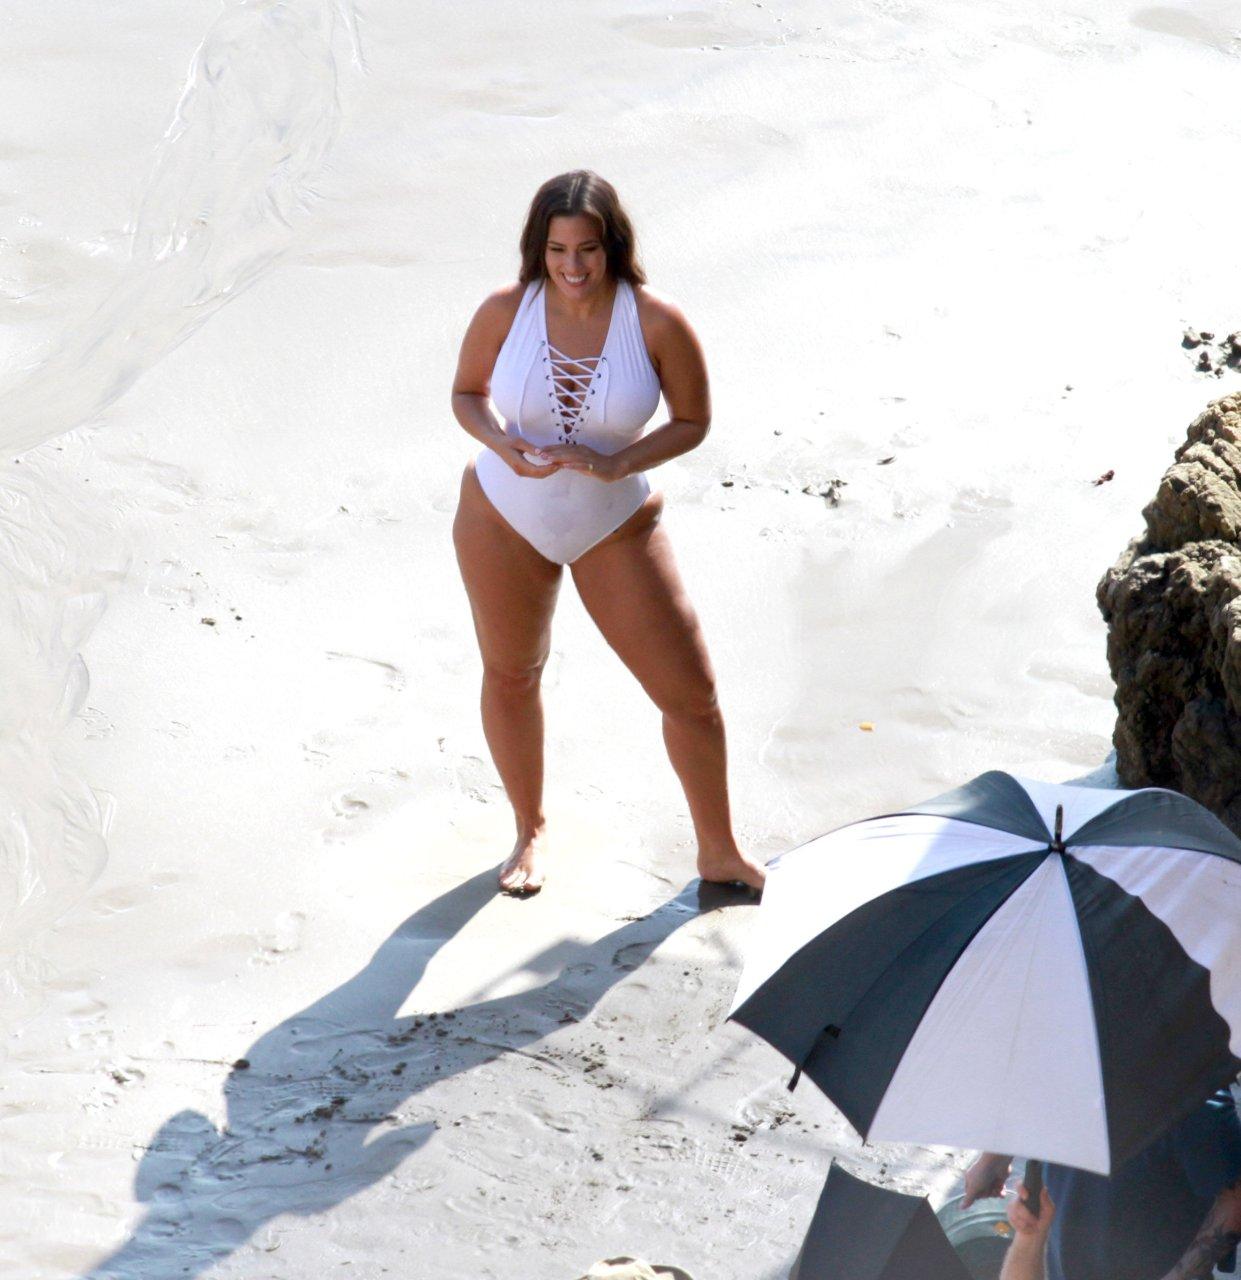 Ashley-Graham-Sexy-TheFappeningBlog.com-39.jpg